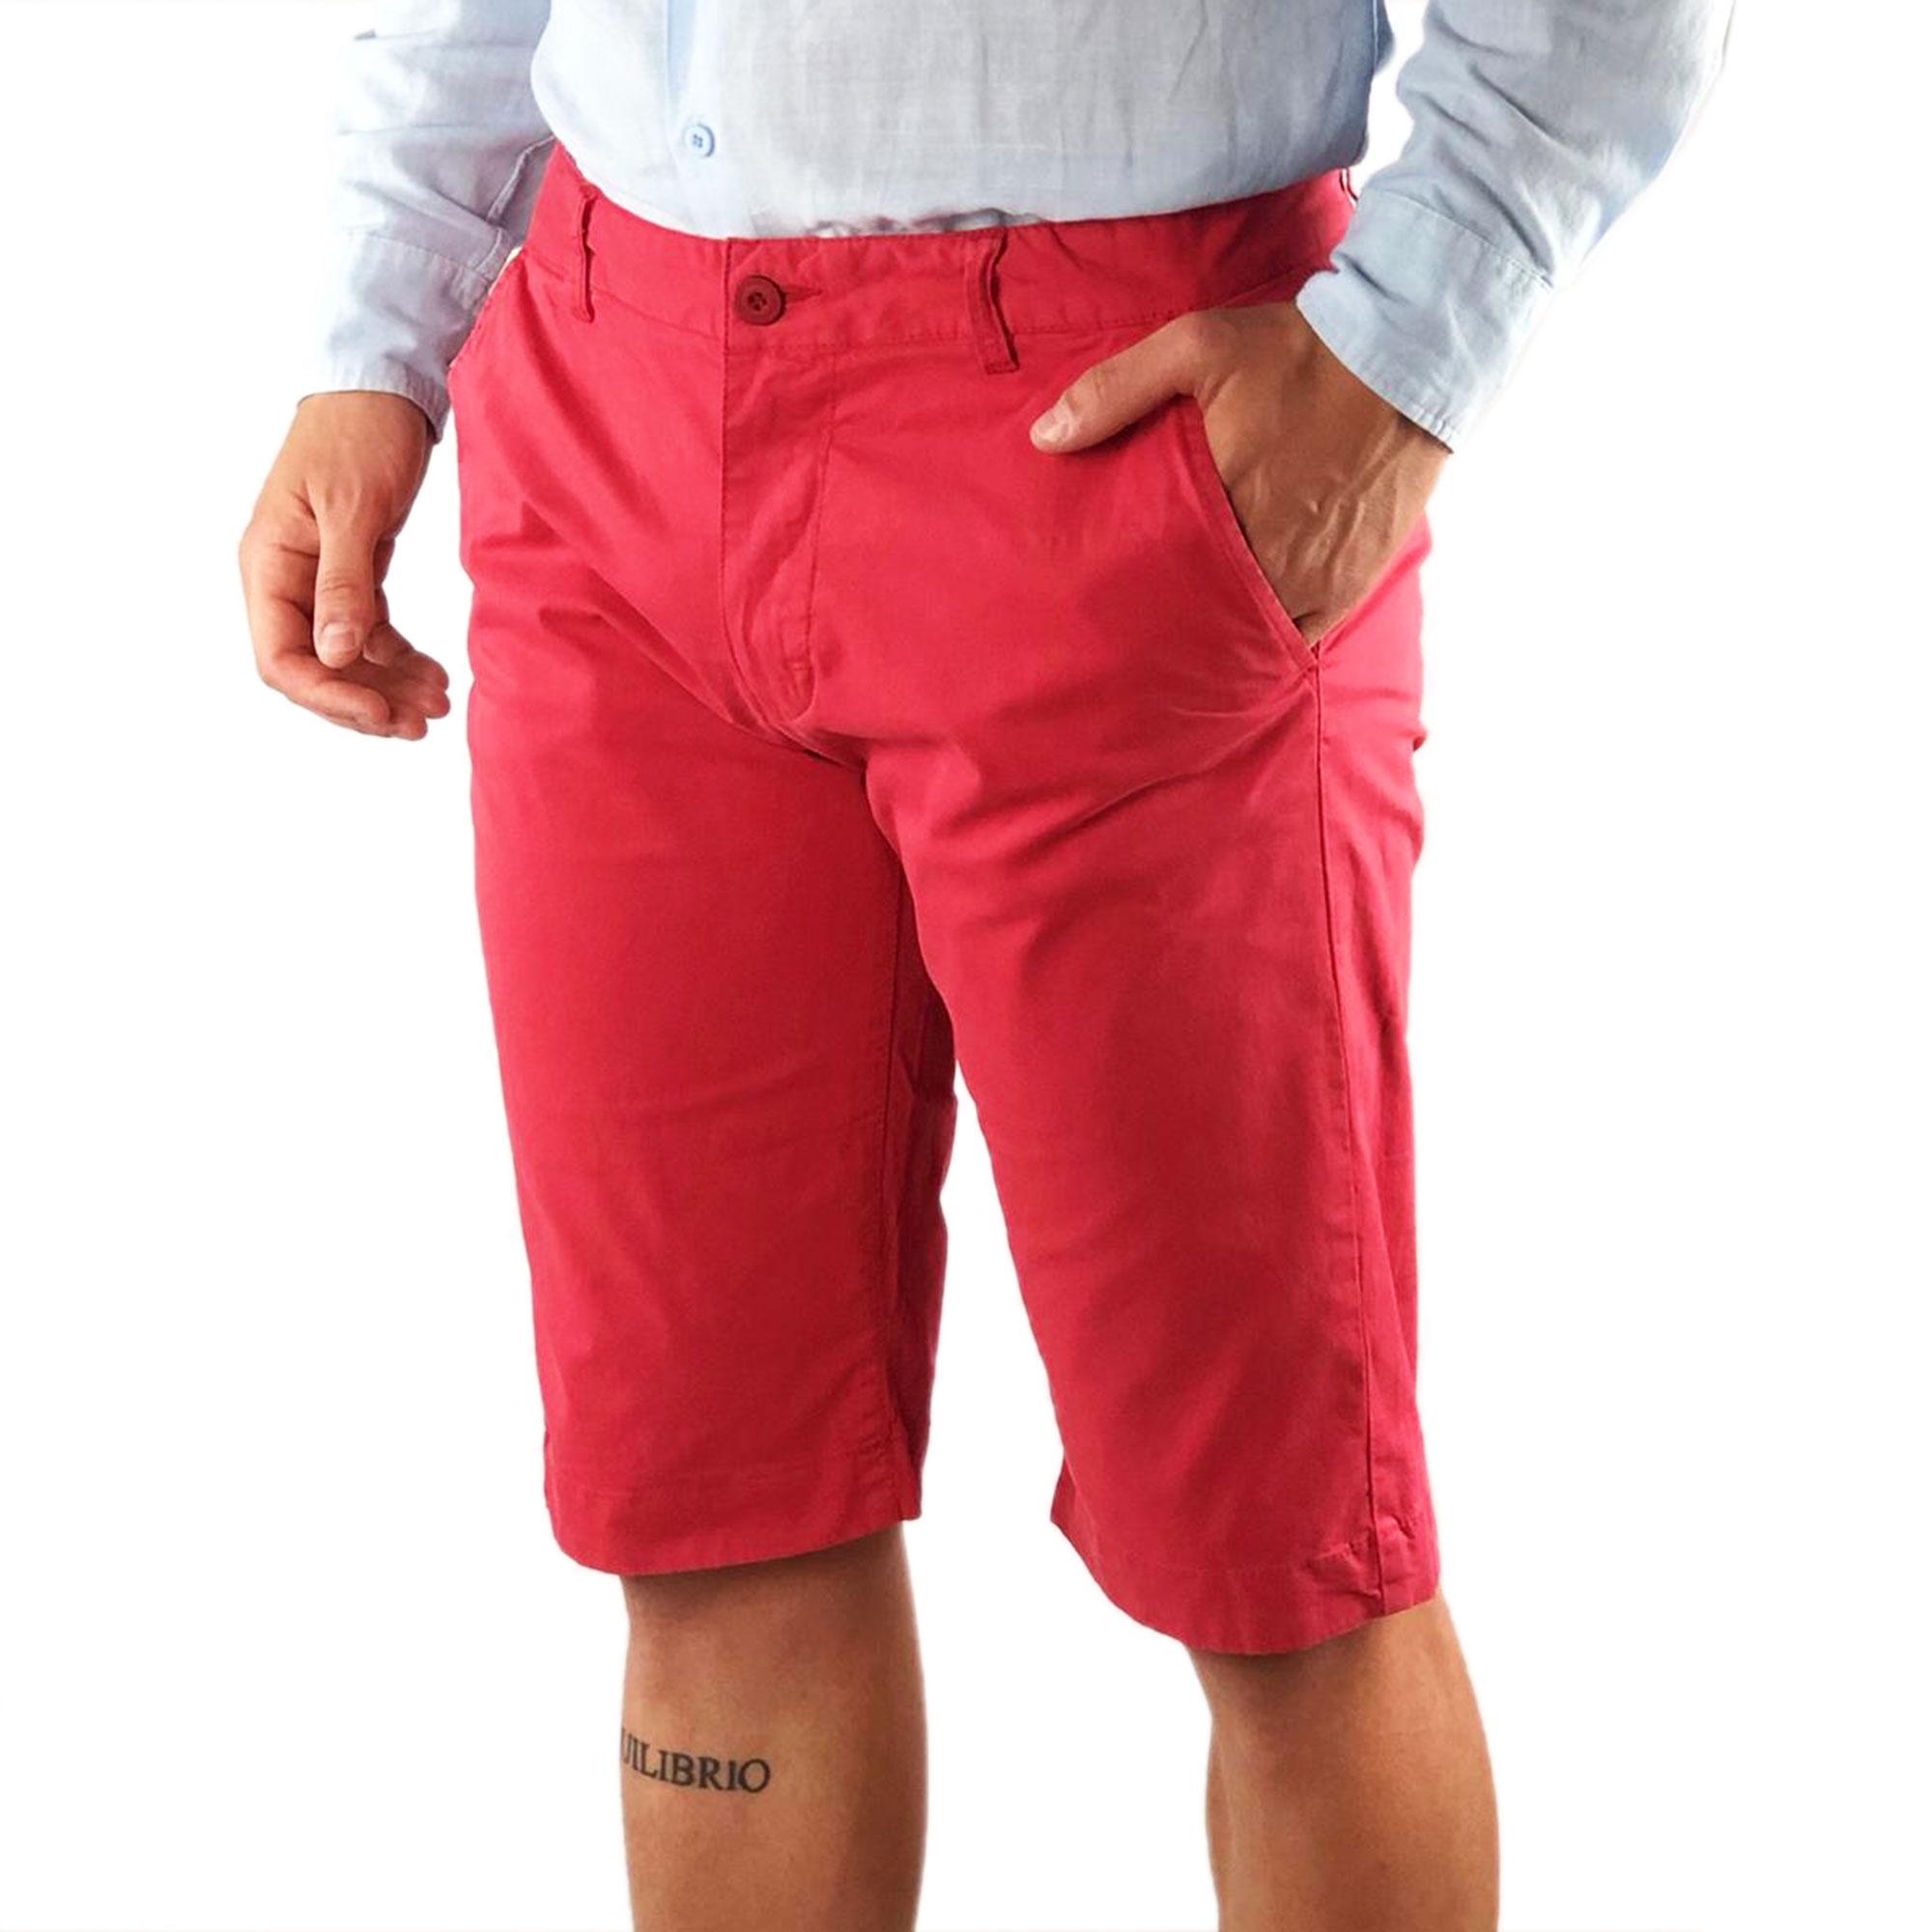 Bermuda-Uomo-Cotone-Slim-Fit-Jeans-Pantalone-Corto-Shorts-Pantaloncini-Casual miniatura 20